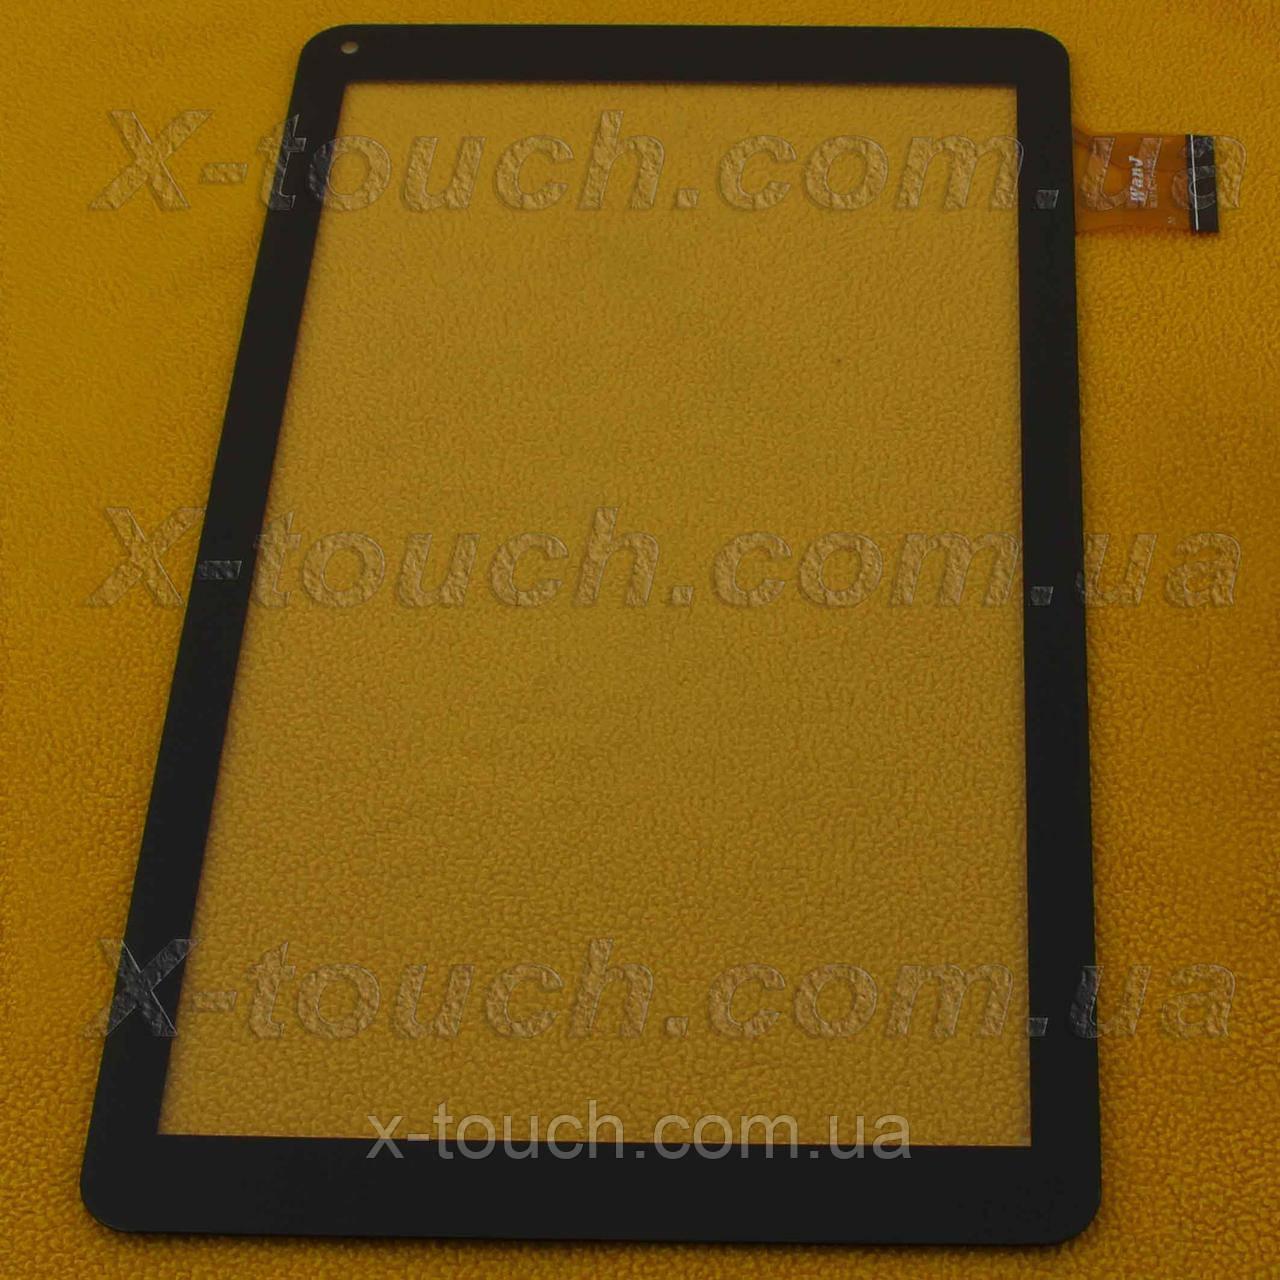 Тачскрин, сенсор WJ819-FPC-V2.0 для планшета